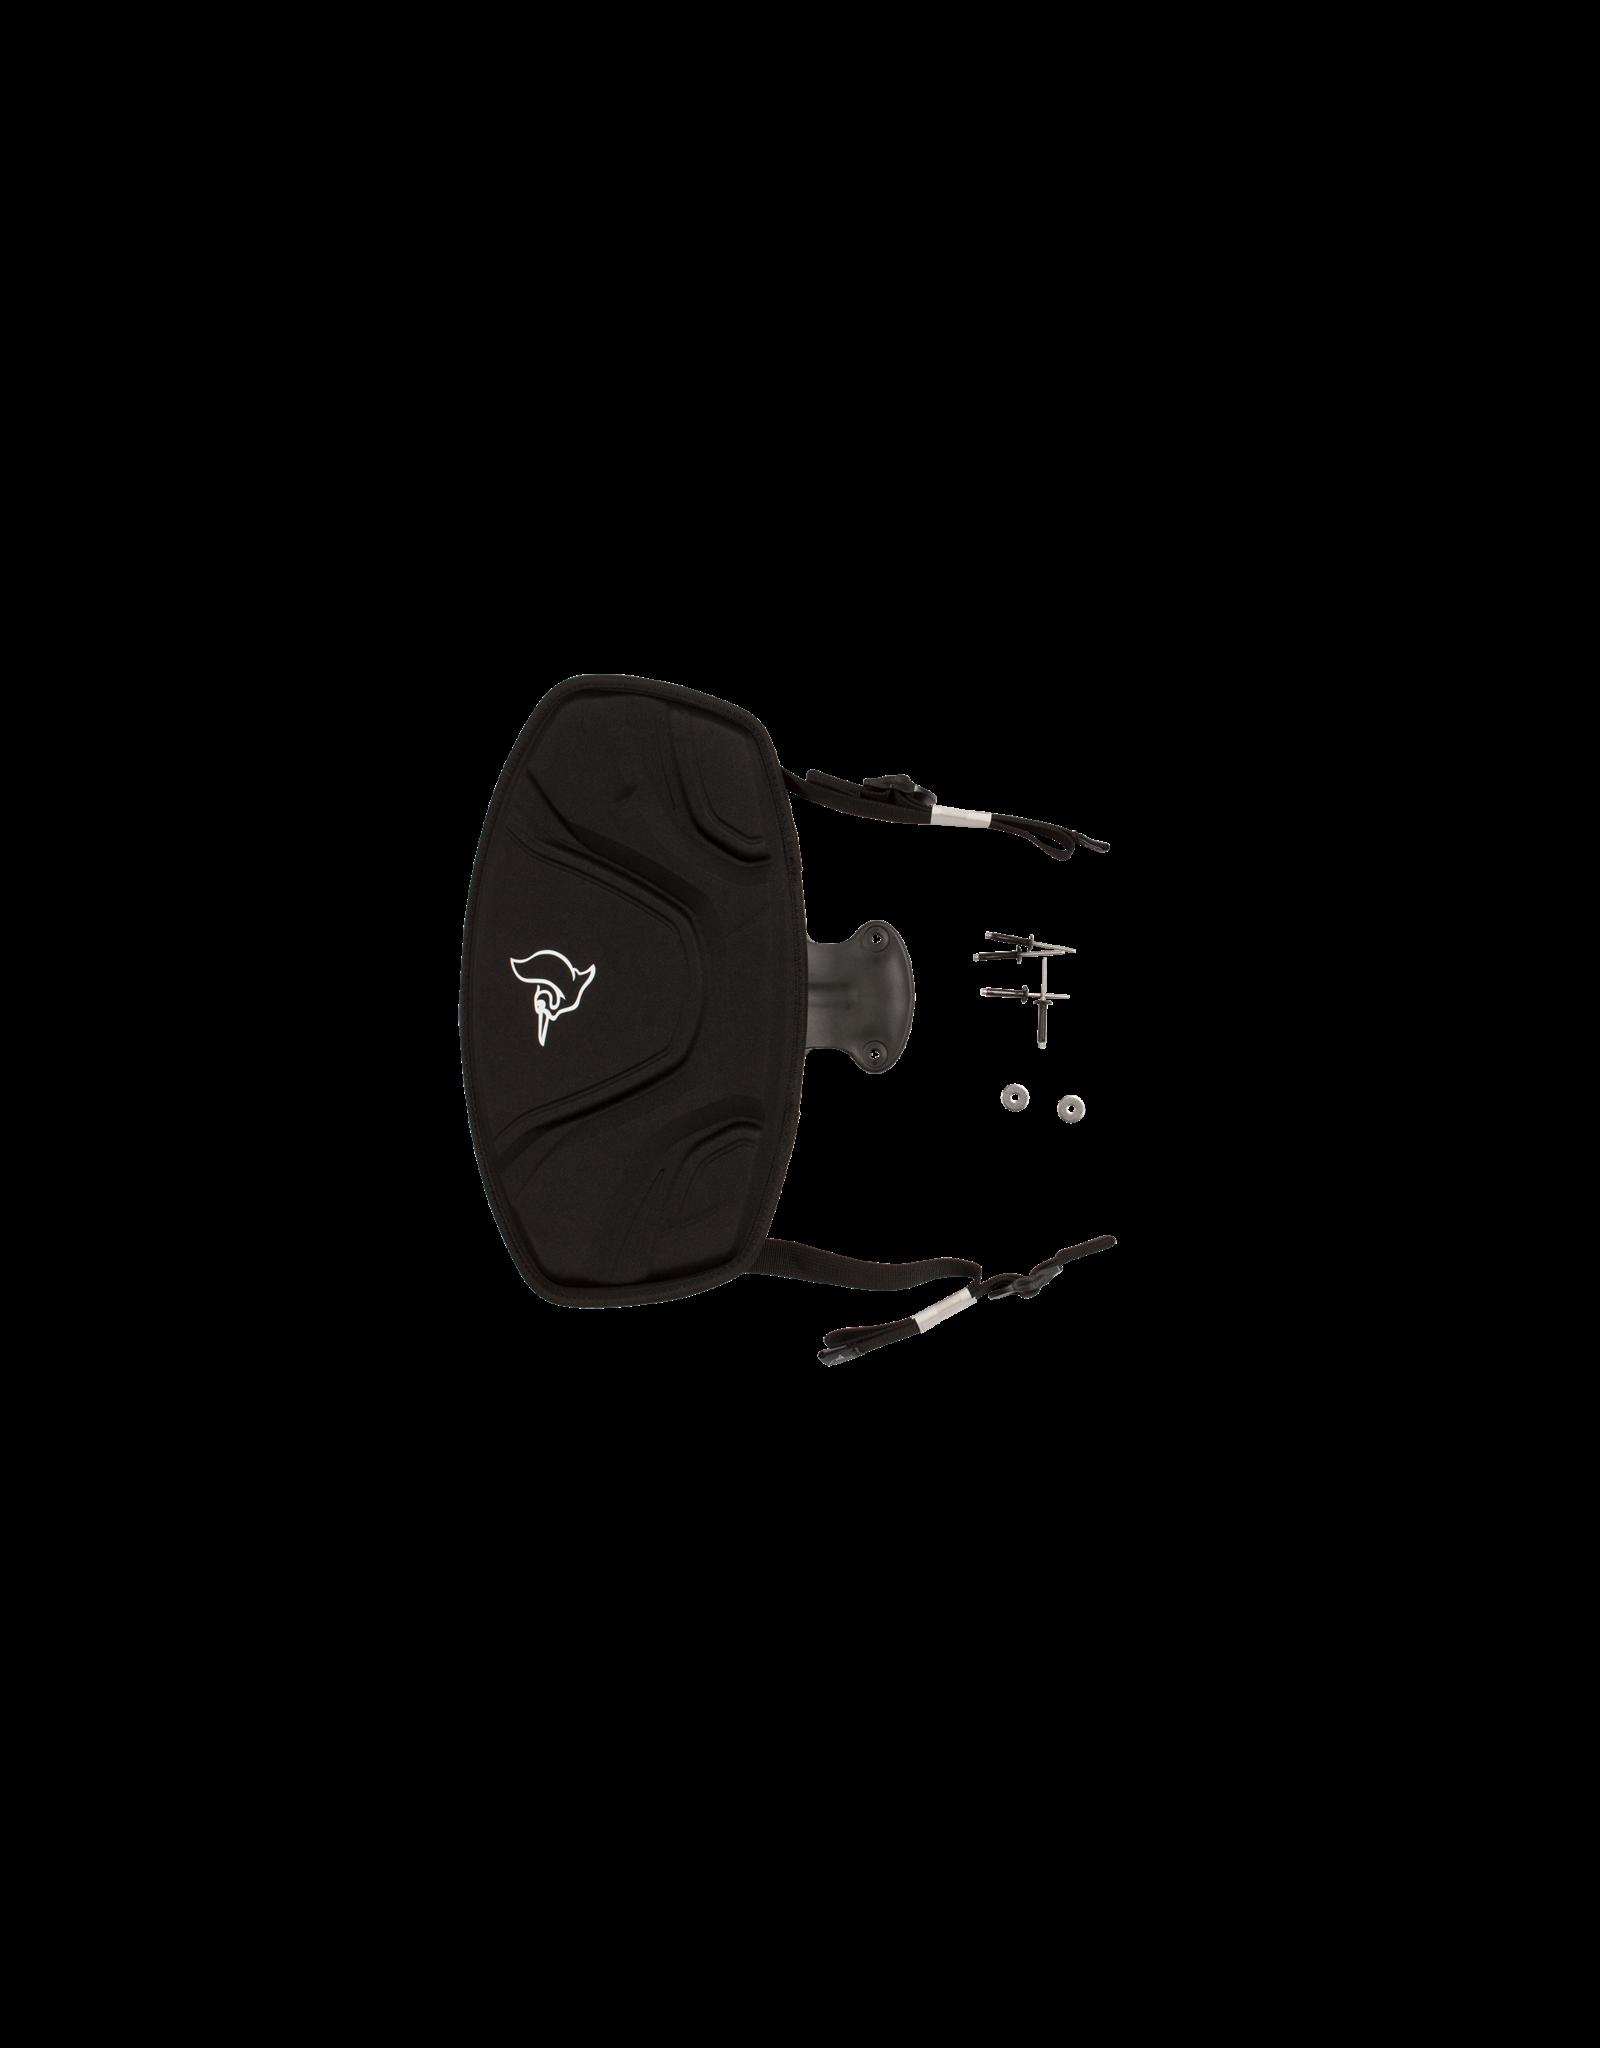 Pelican Pelican Acc. Standard Adjustable Cushion - Backrest Only